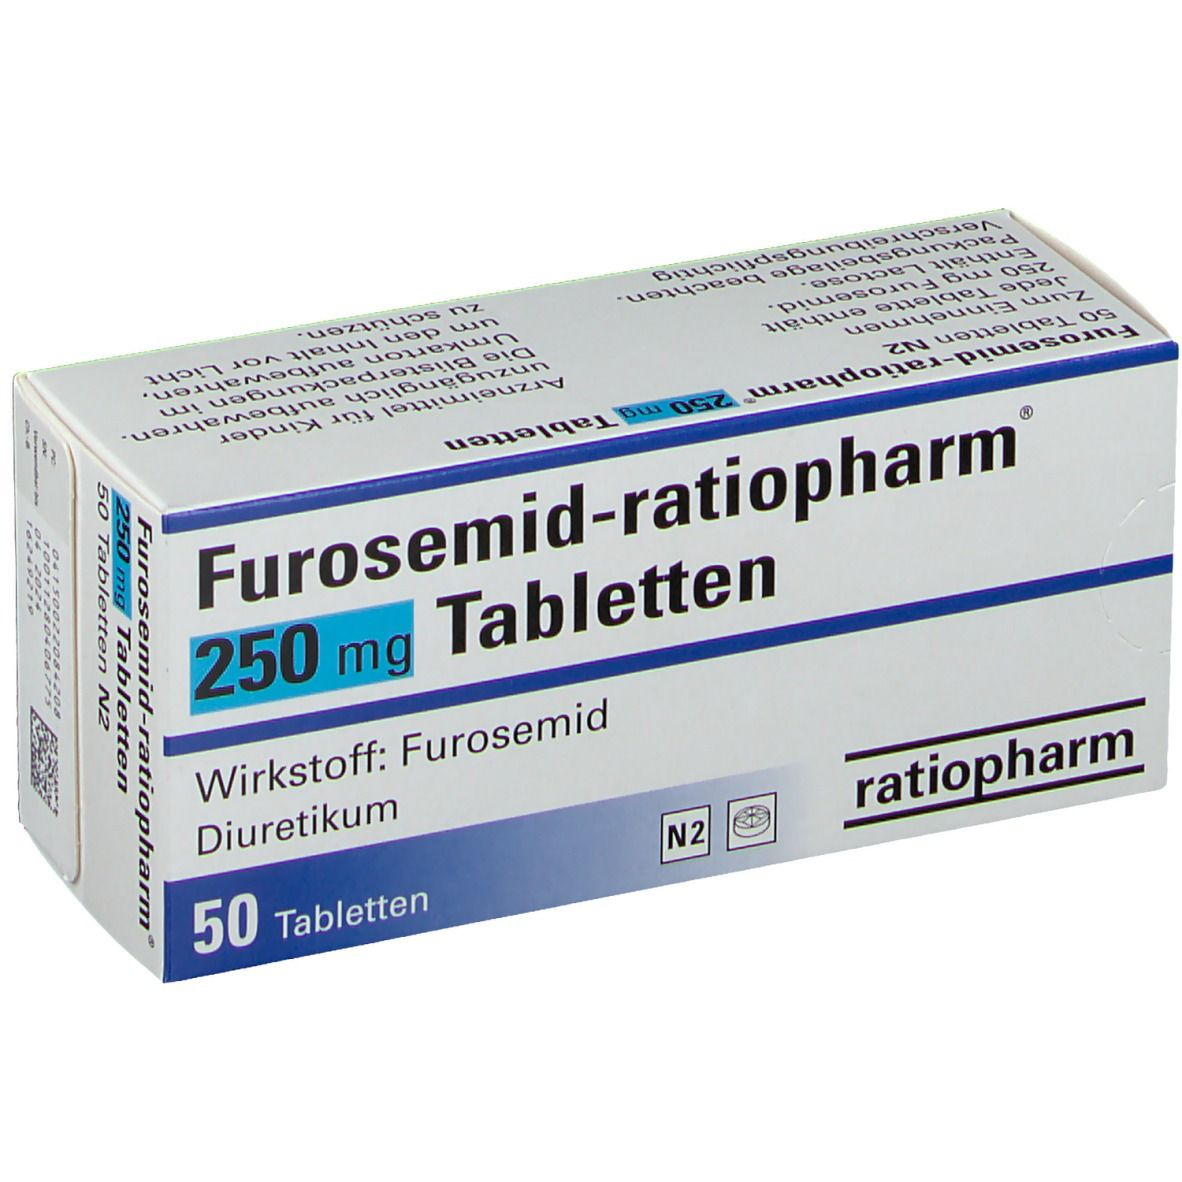 Furosemid-ratiopharm® 250 mg Tabletten